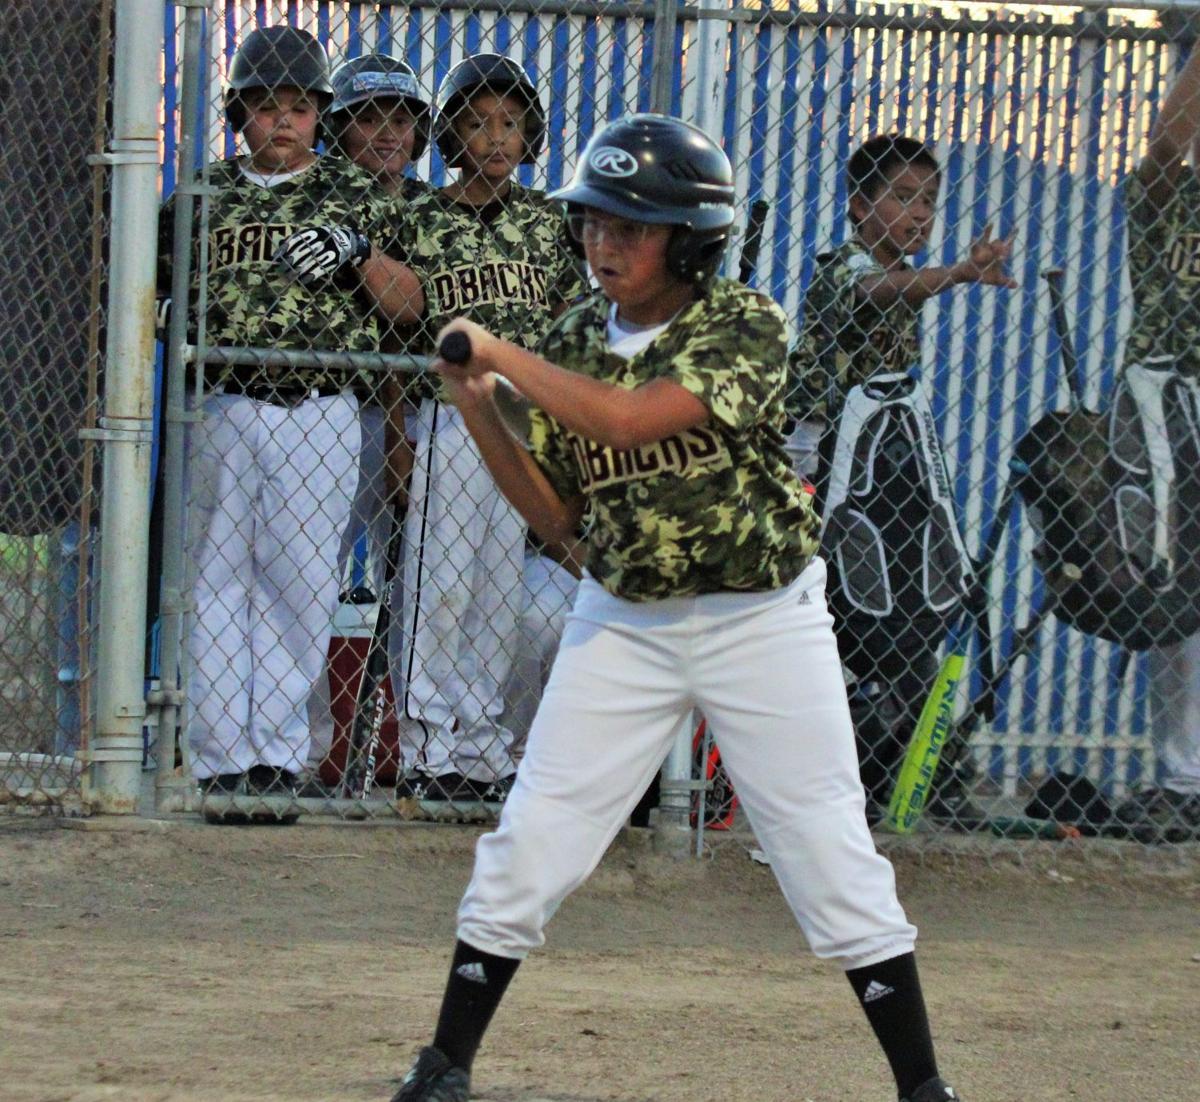 200709-sports-llbball (2).JPG